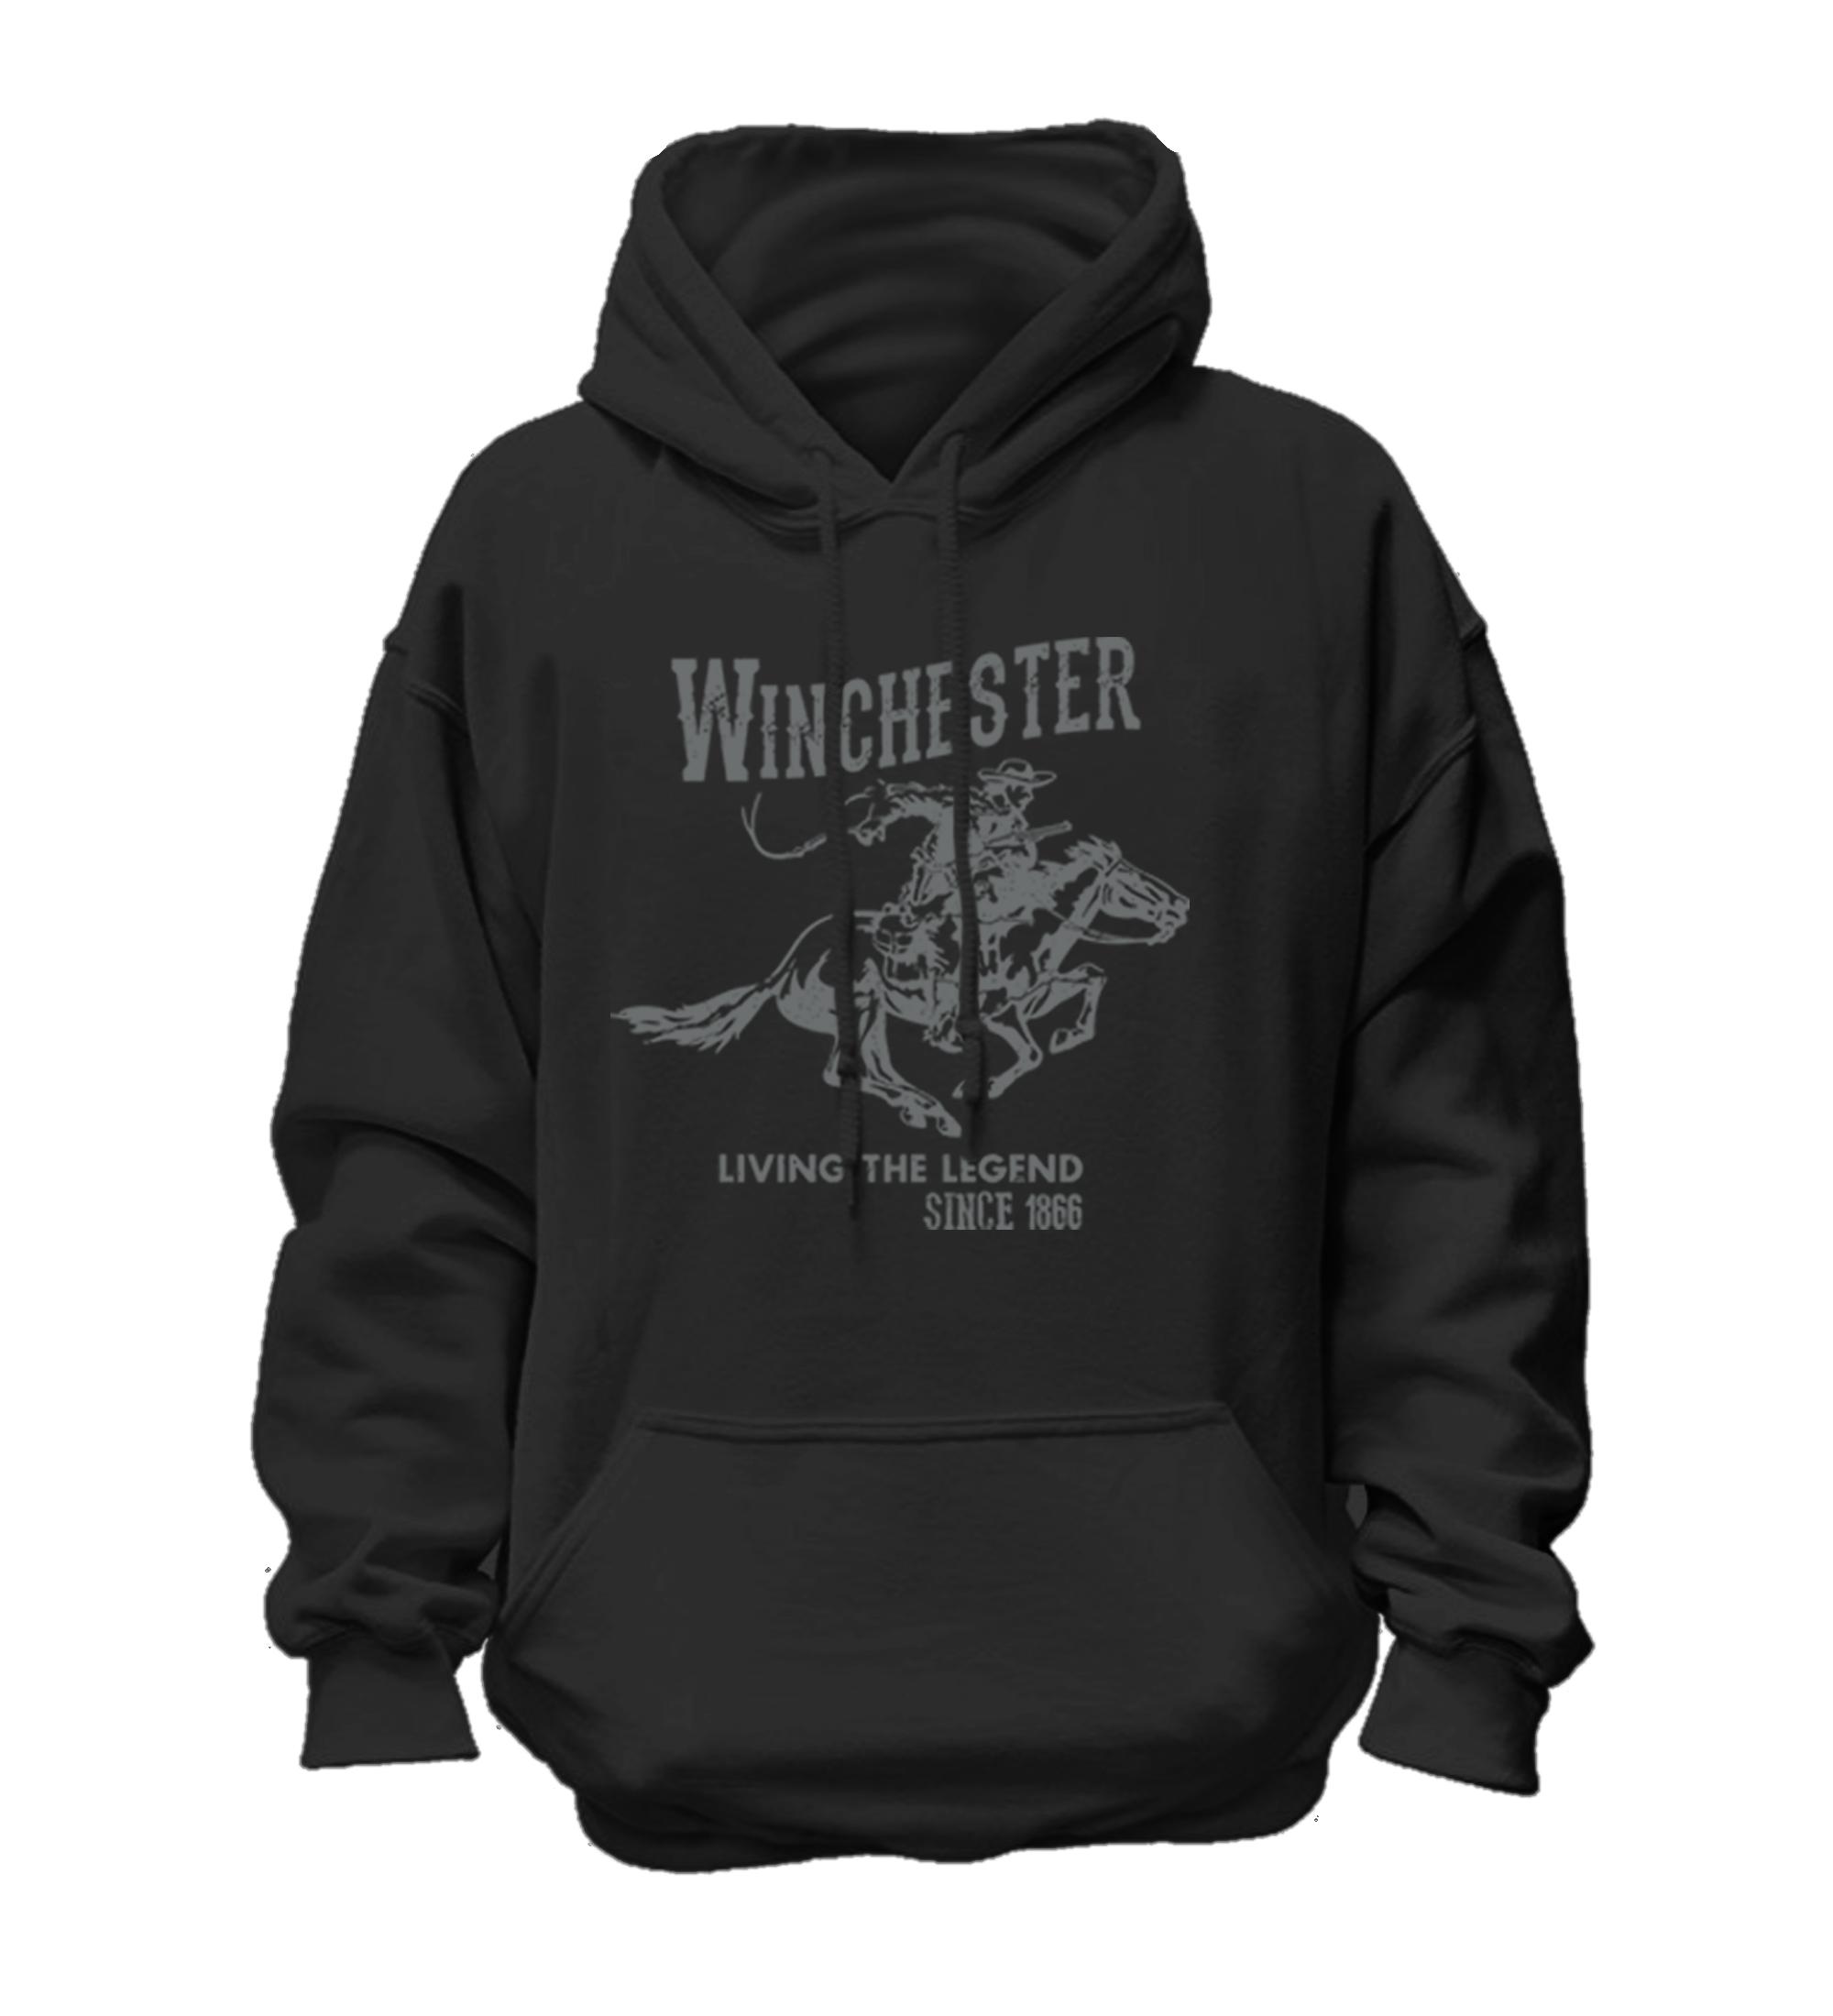 Winchester Official Mens Vintage Rider Classic Fleece Pullover Hoodie Sweatshirt